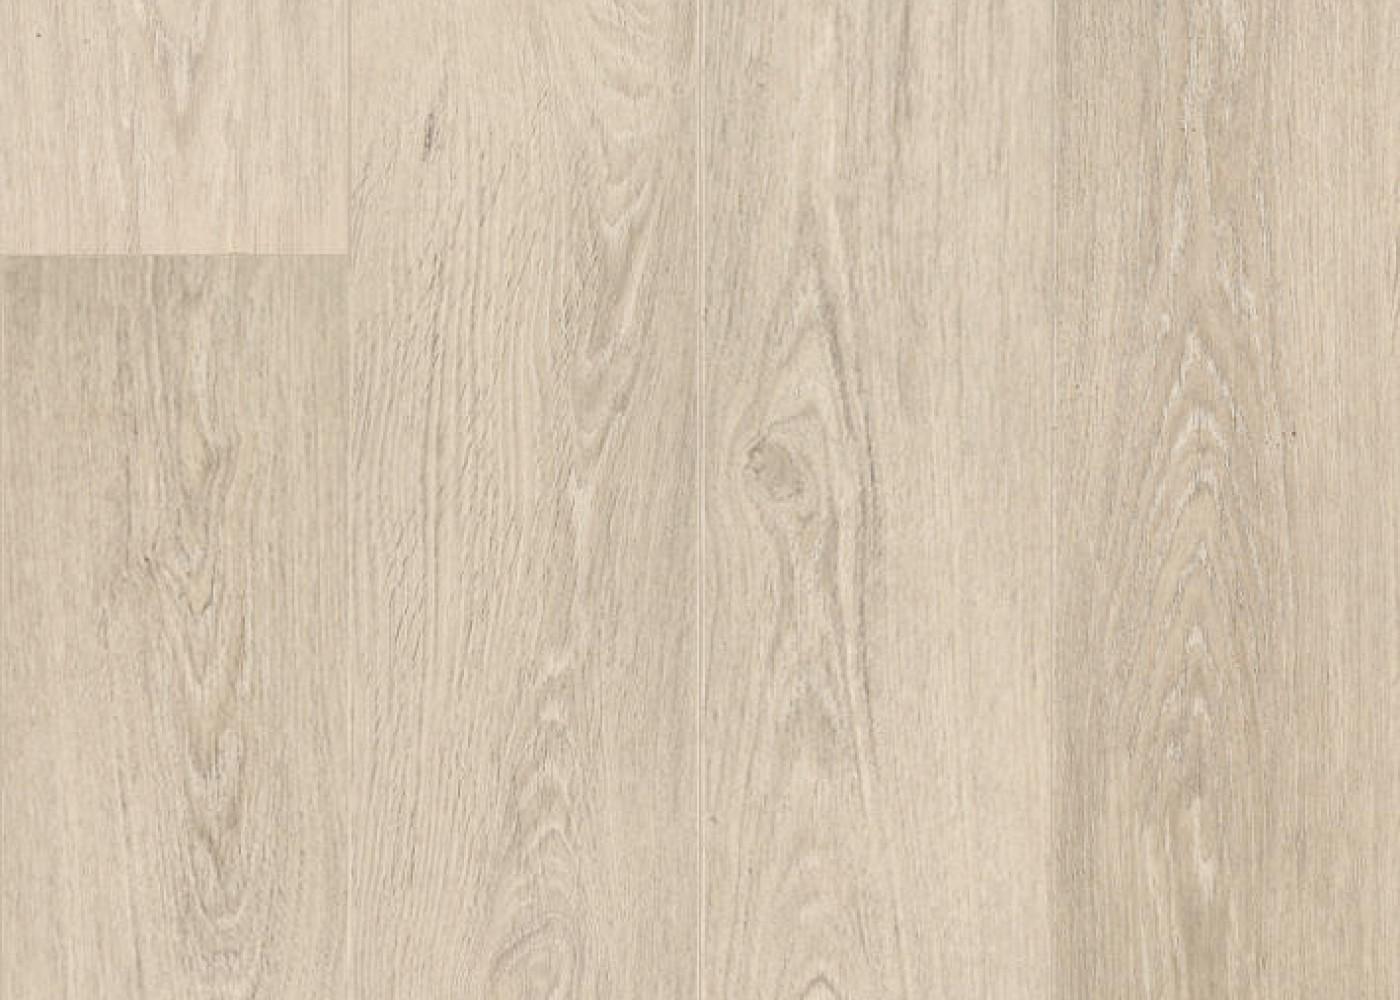 Vinyle rigide Chêne Withsundays passage commercial 4.5x225x1524